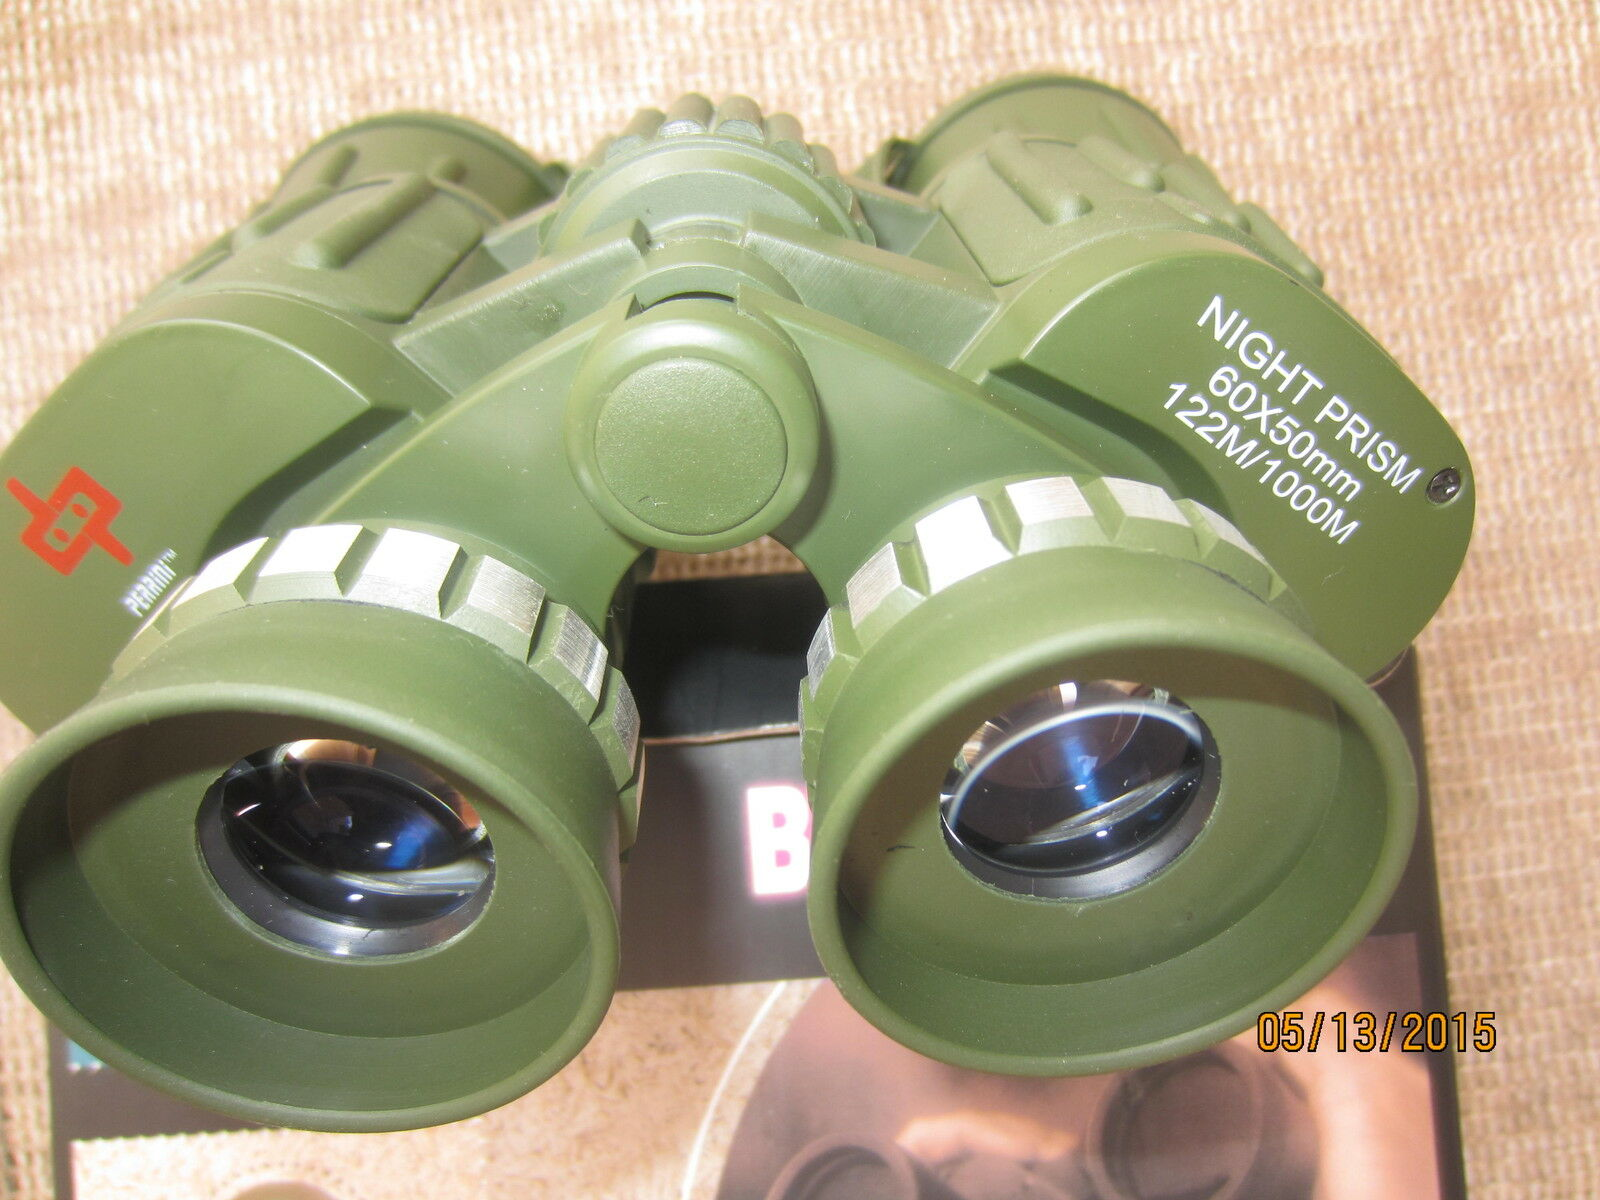 Brand new Day/NightPrism 60-50 Zoom Binoculars CAMO.New Model